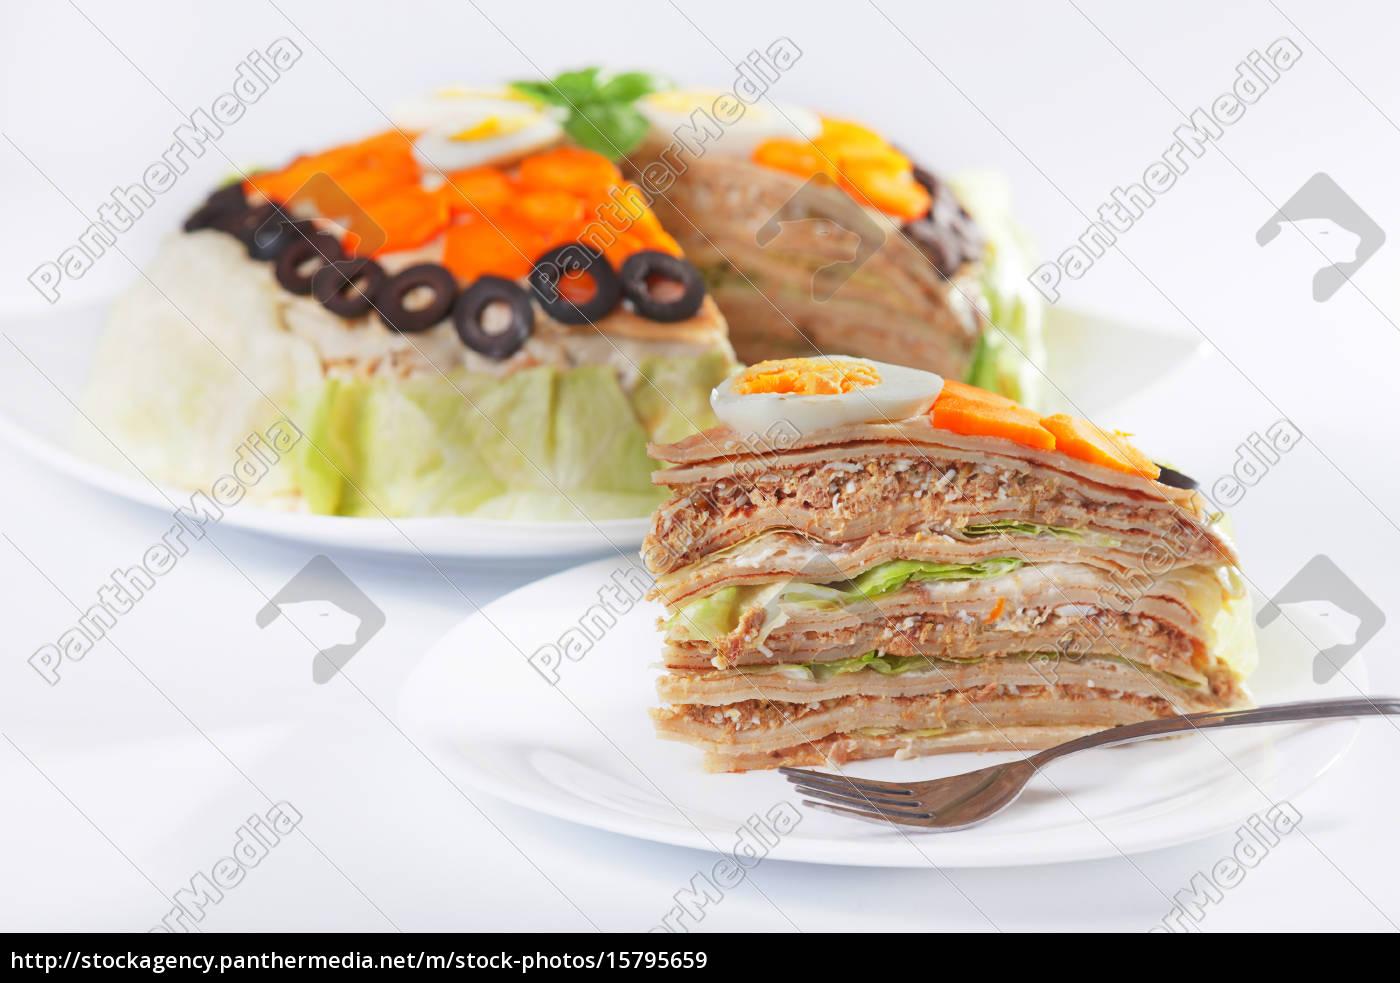 salty, pancake, cake, salty, pancake, cake, salty, pancake - 15795659